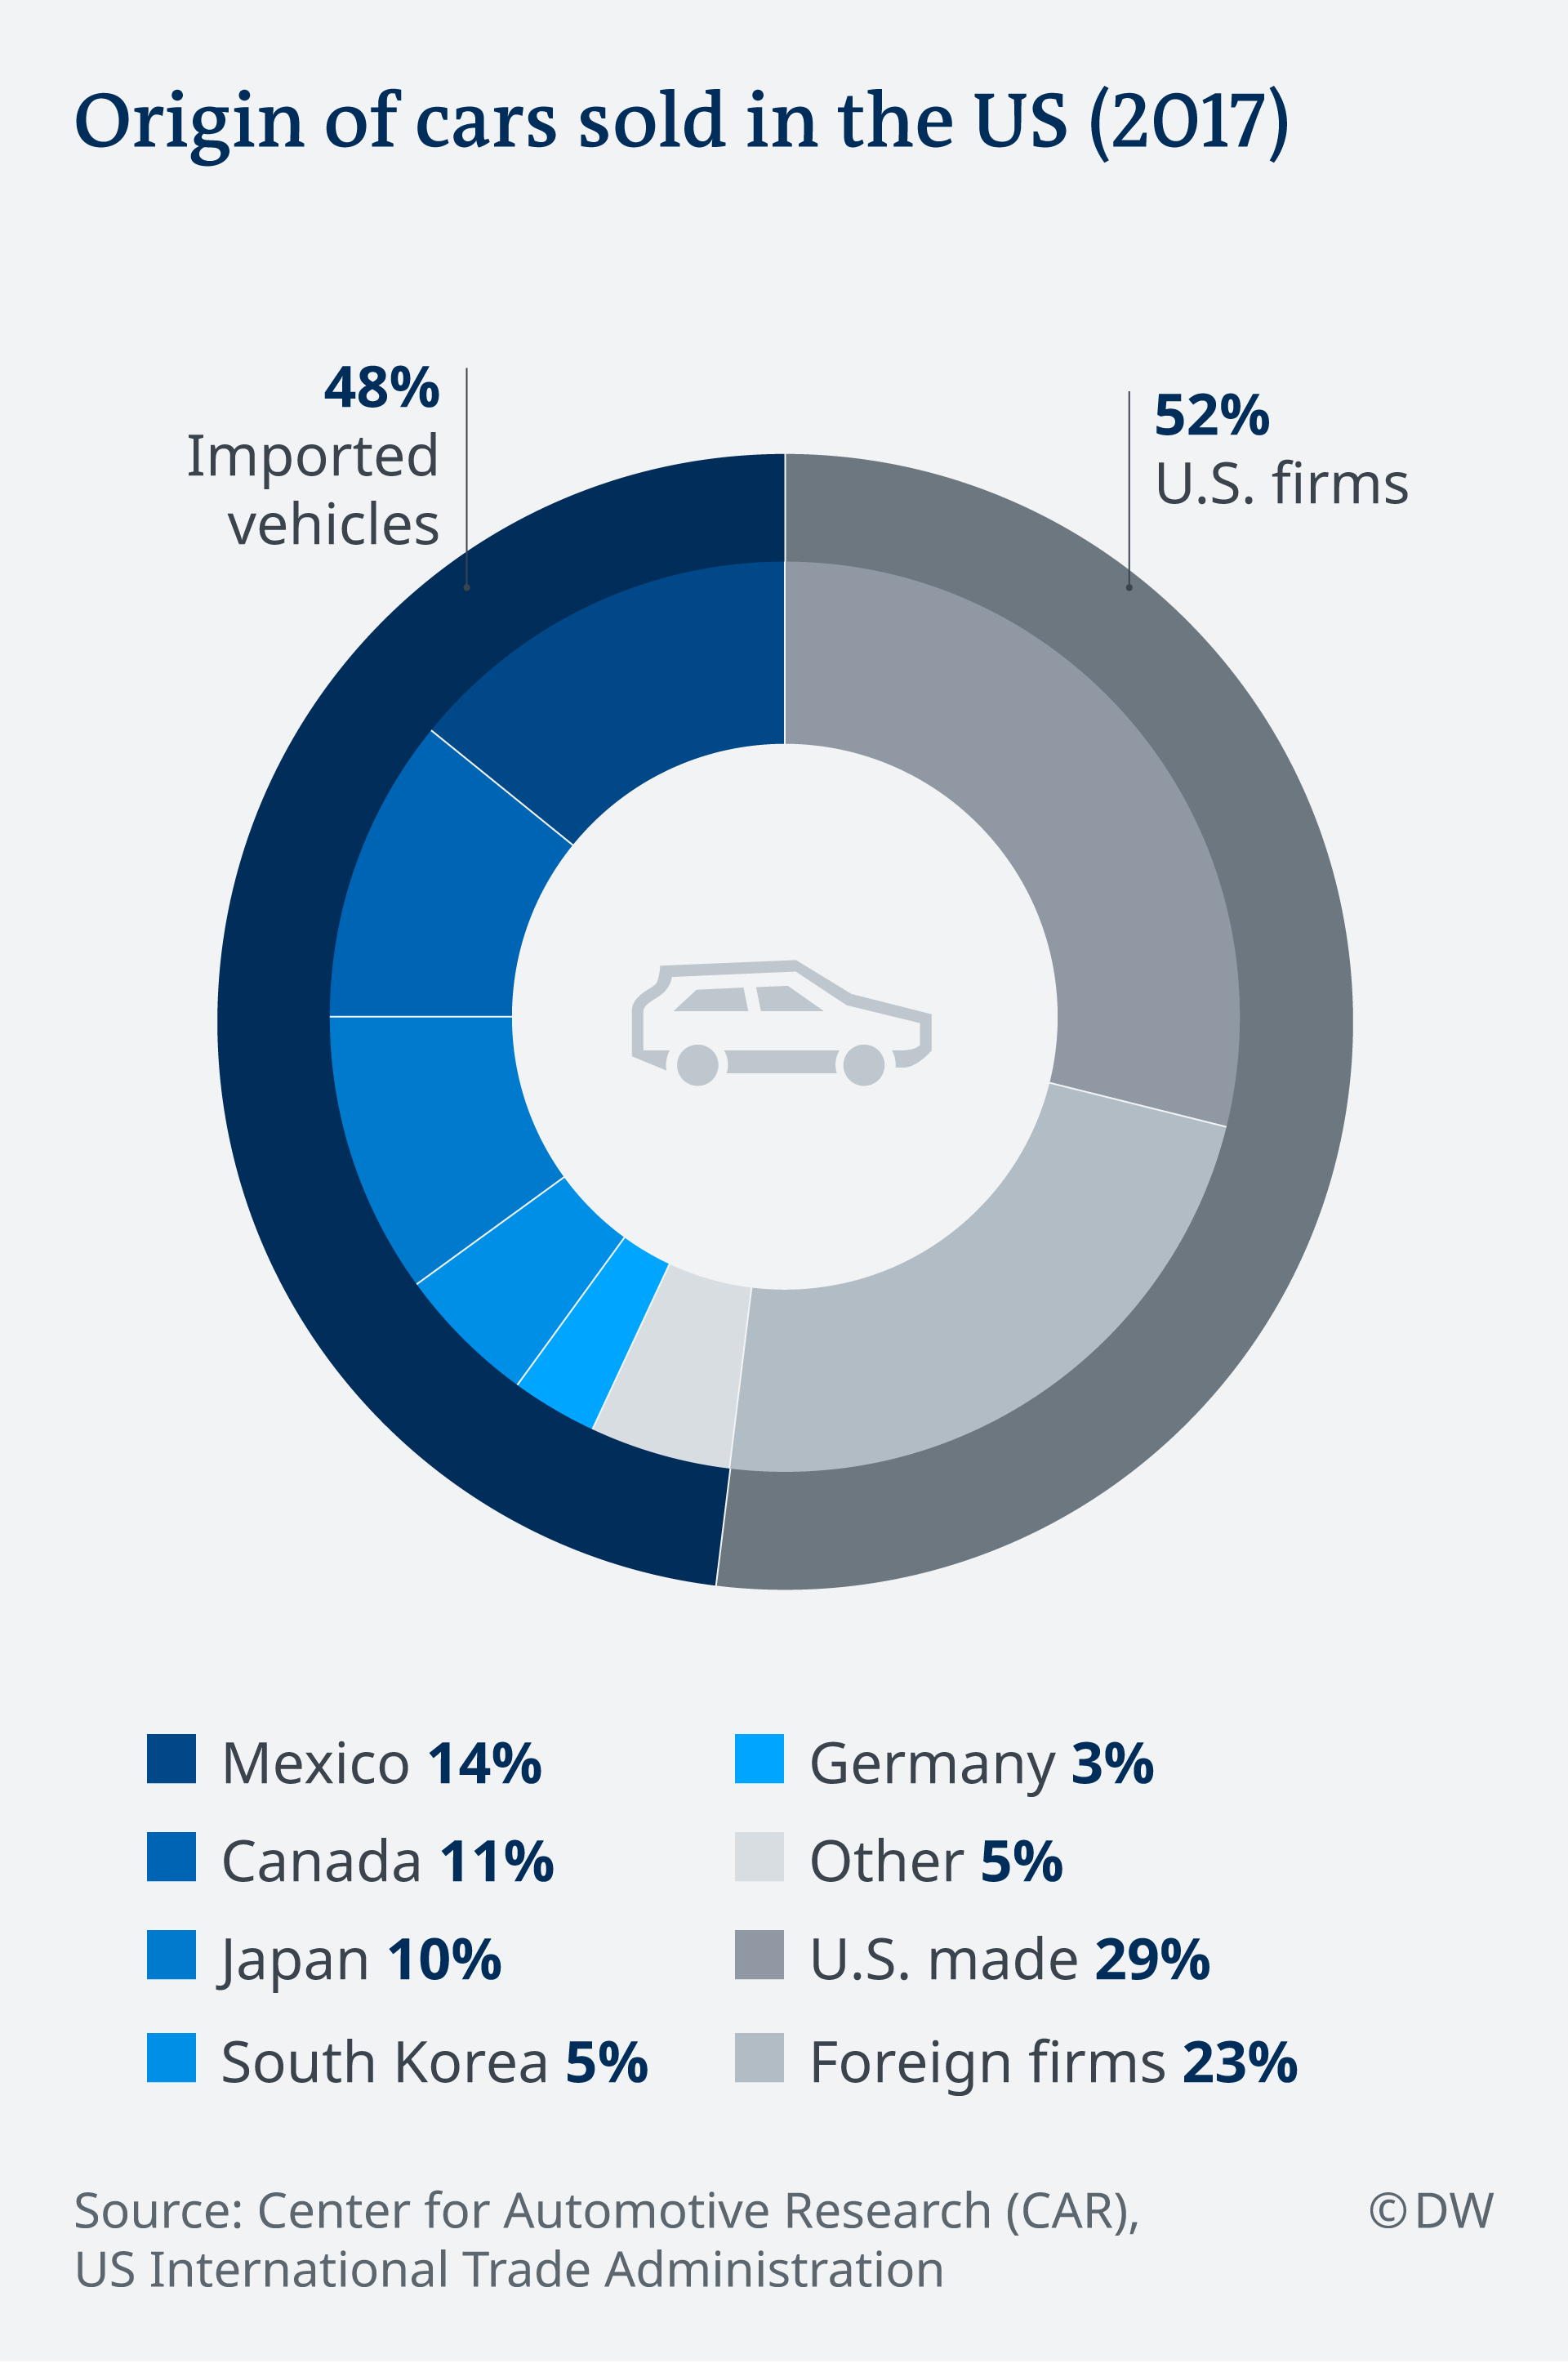 Infografik Herkunft der in den USA verkauften Autos (2017) EN